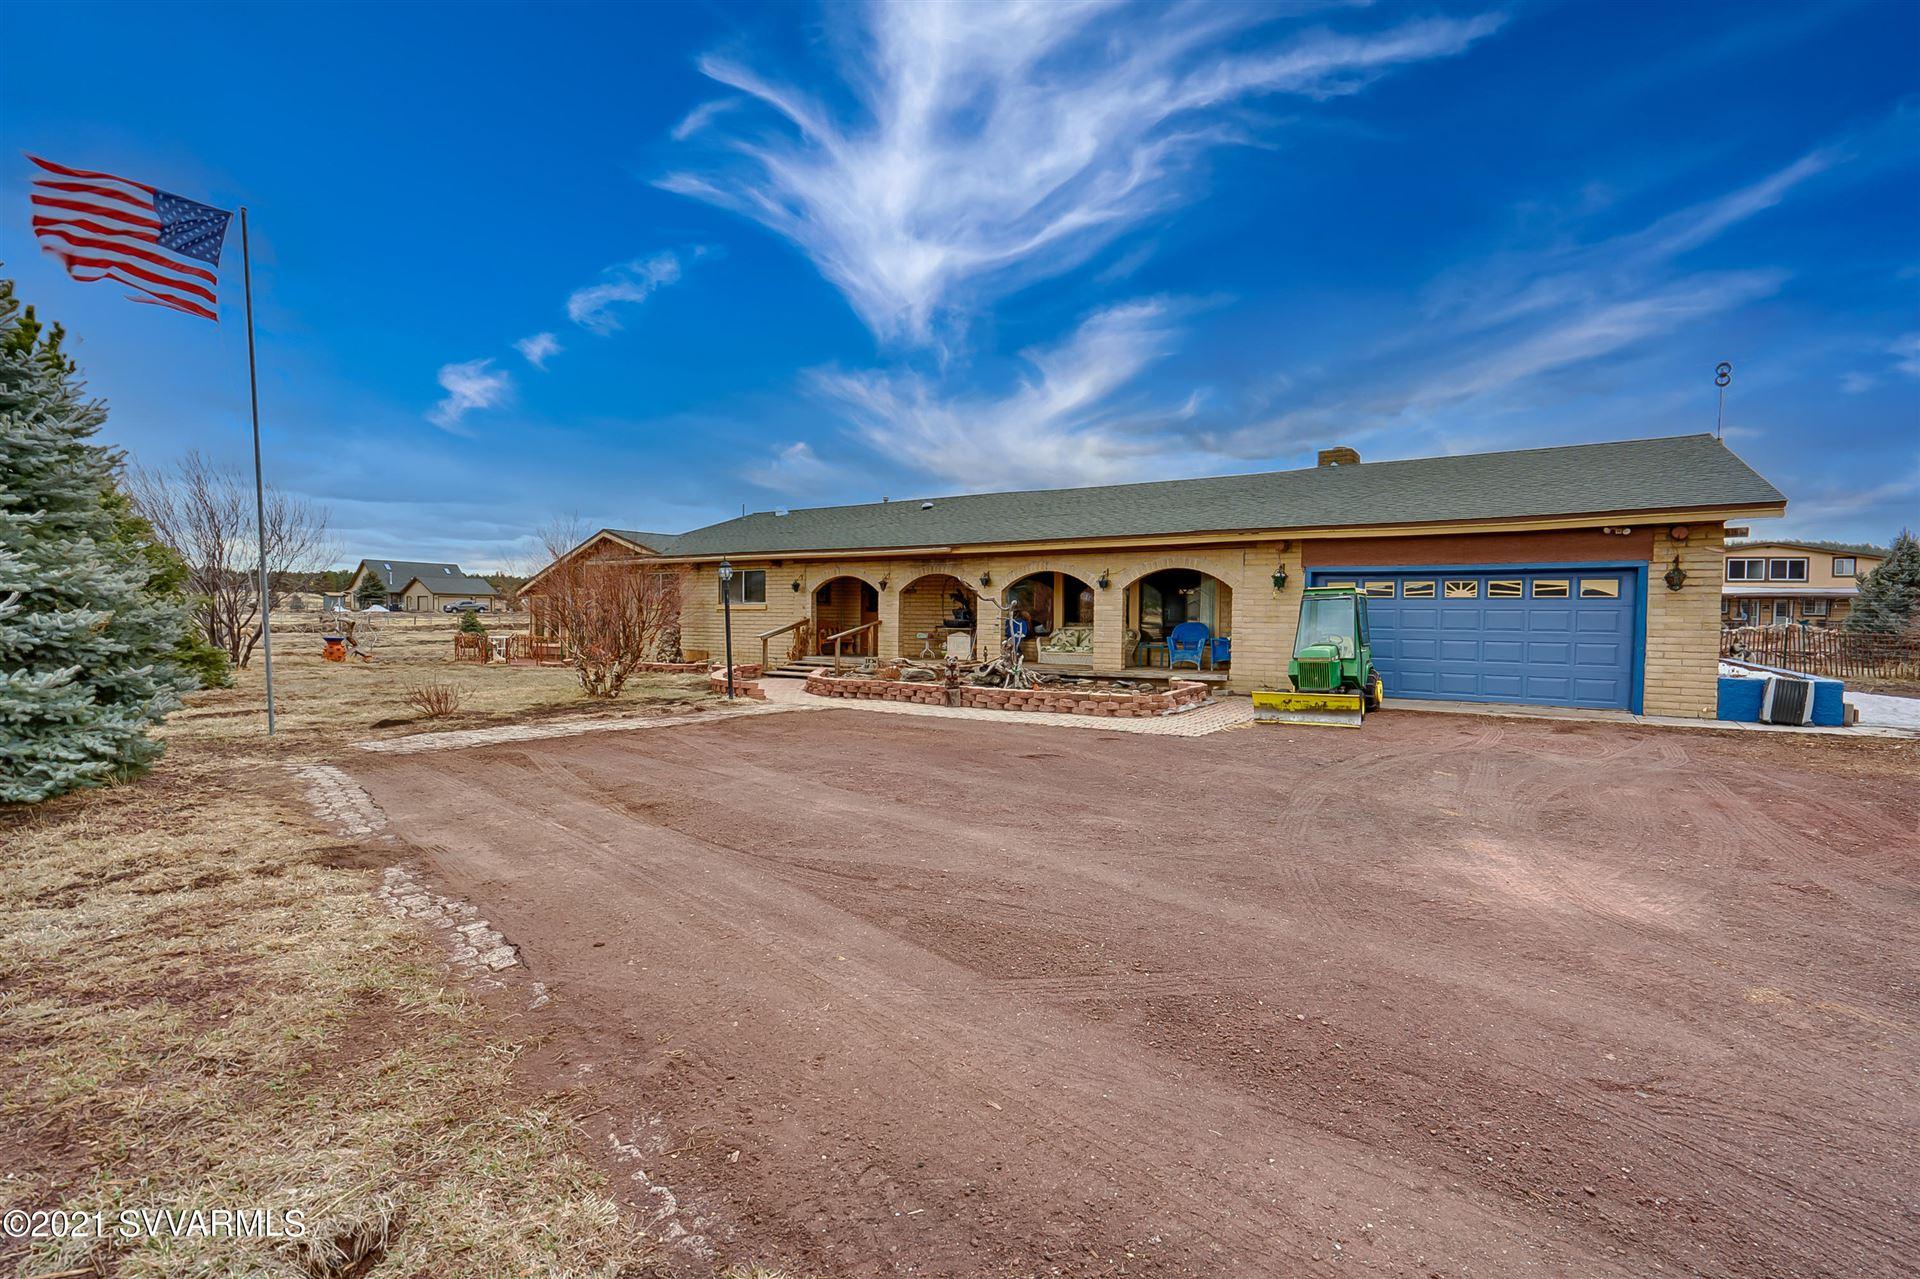 Photo of 8725 W Antoinette Way, Flagstaff, AZ 86001 (MLS # 525743)